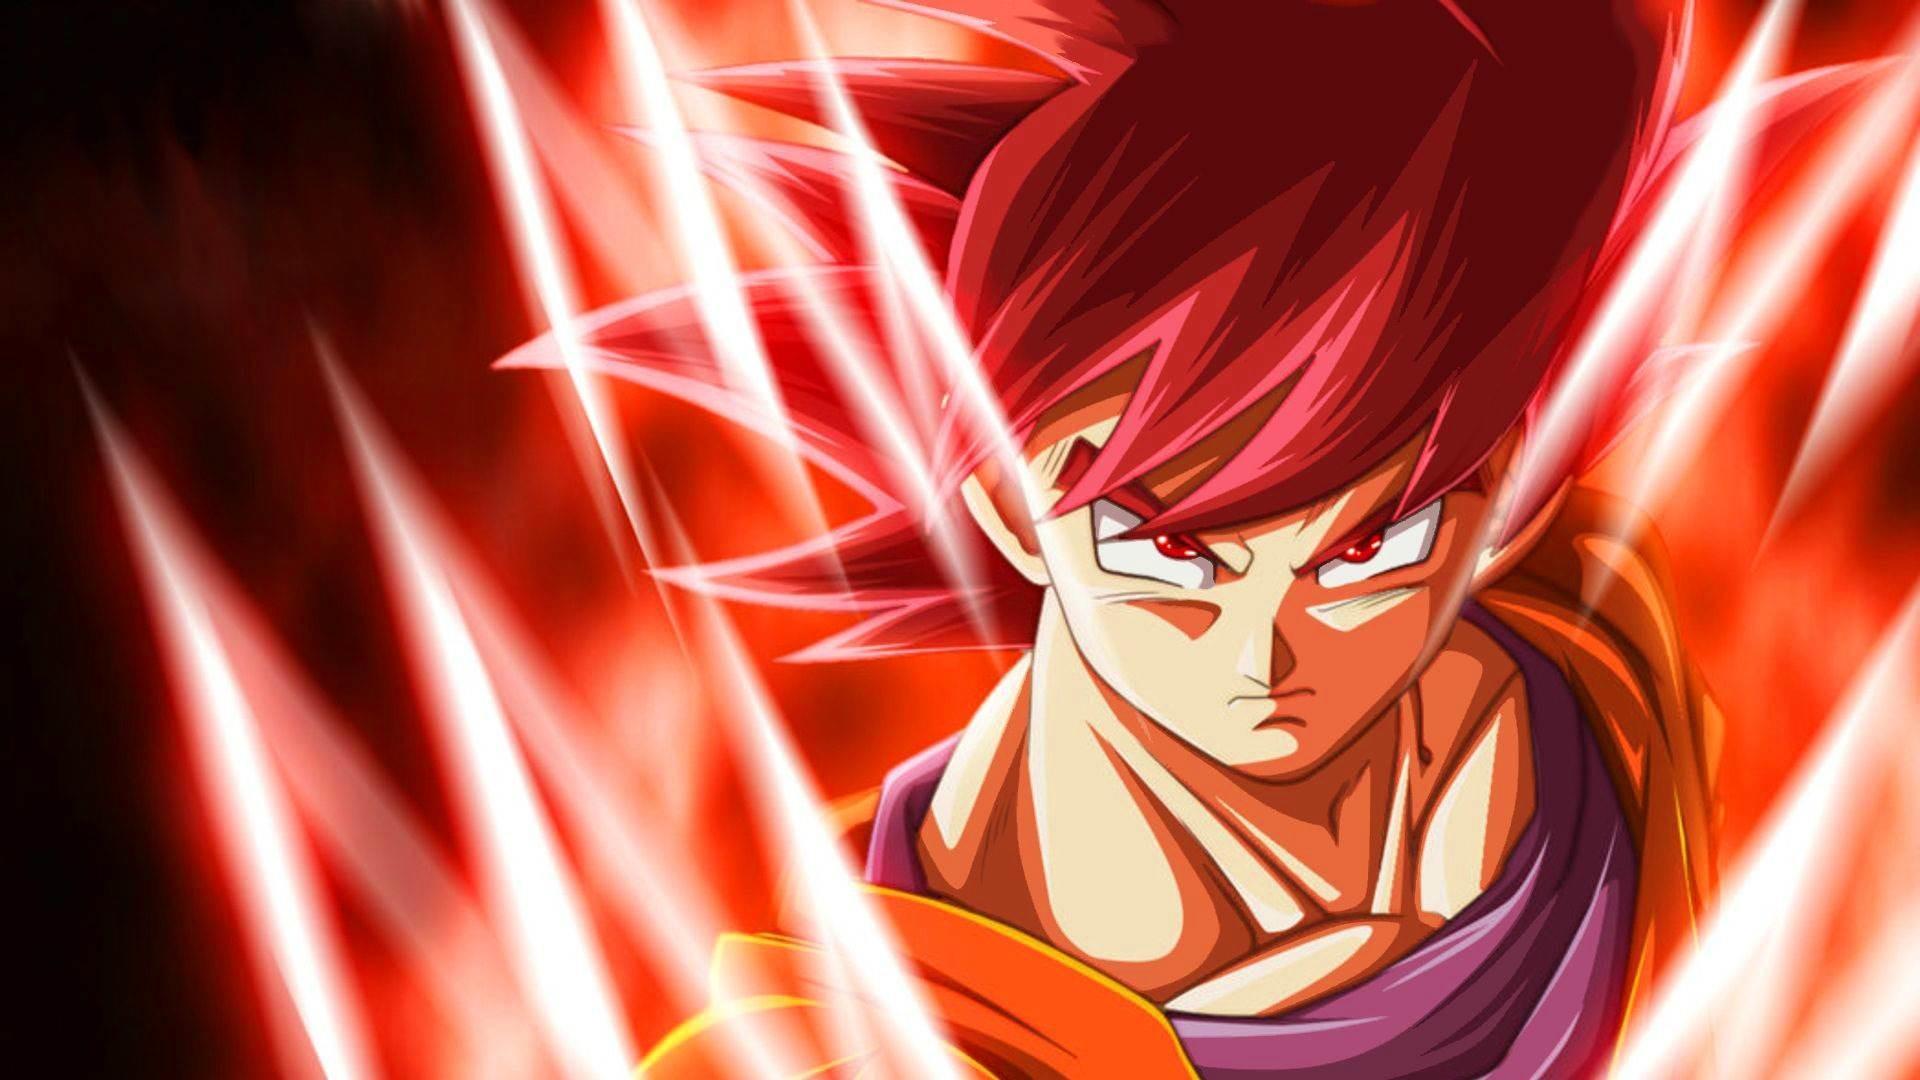 Goku Super Saiyan 4 Wallpaper 66 images 1920x1080